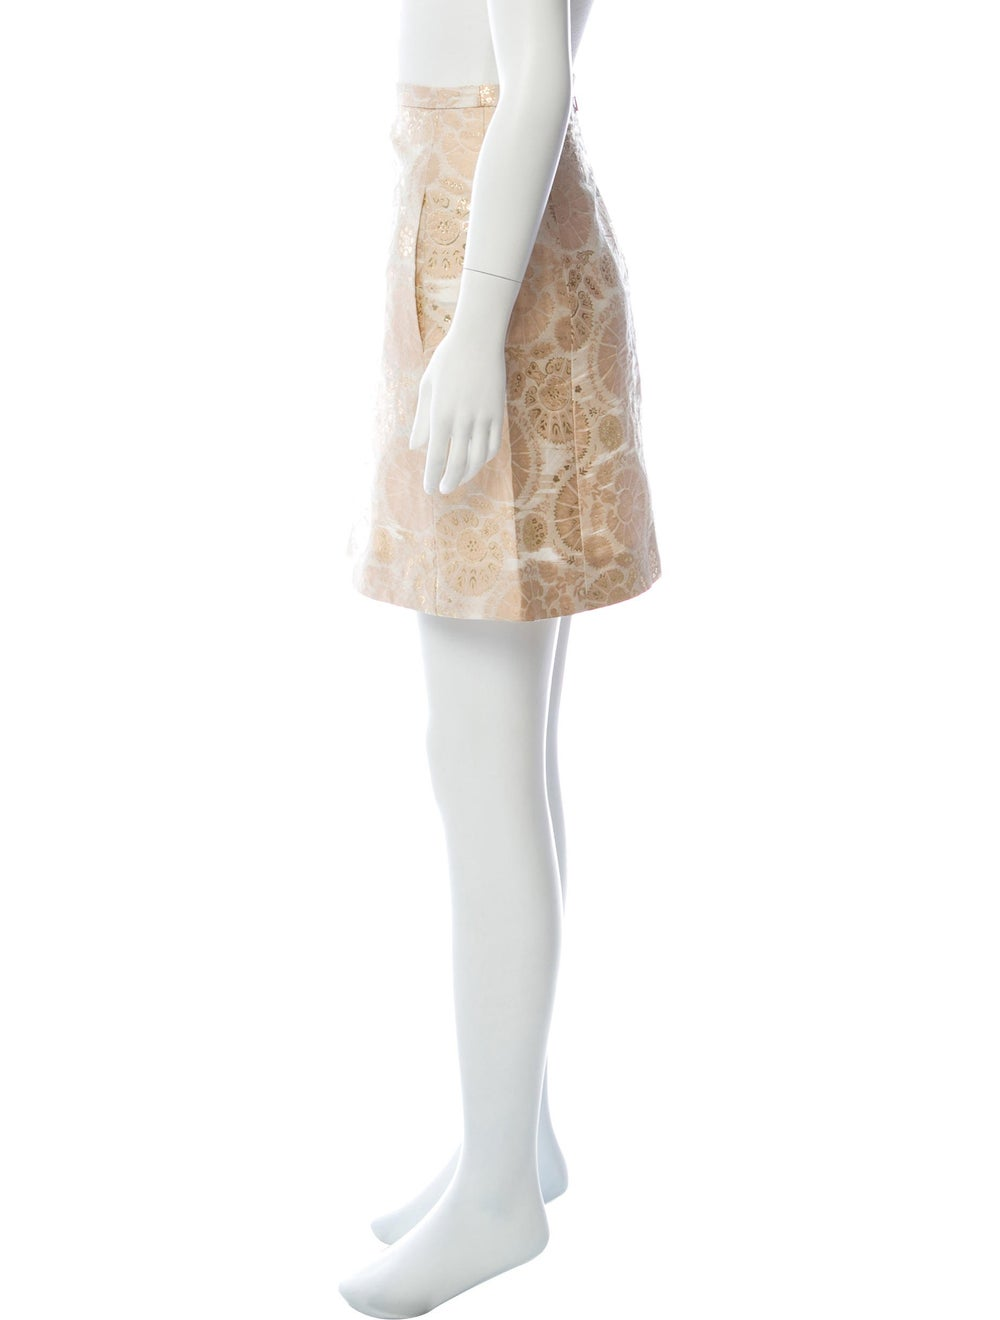 Chloé Silk Brocade Mini Skirt Pink - image 2